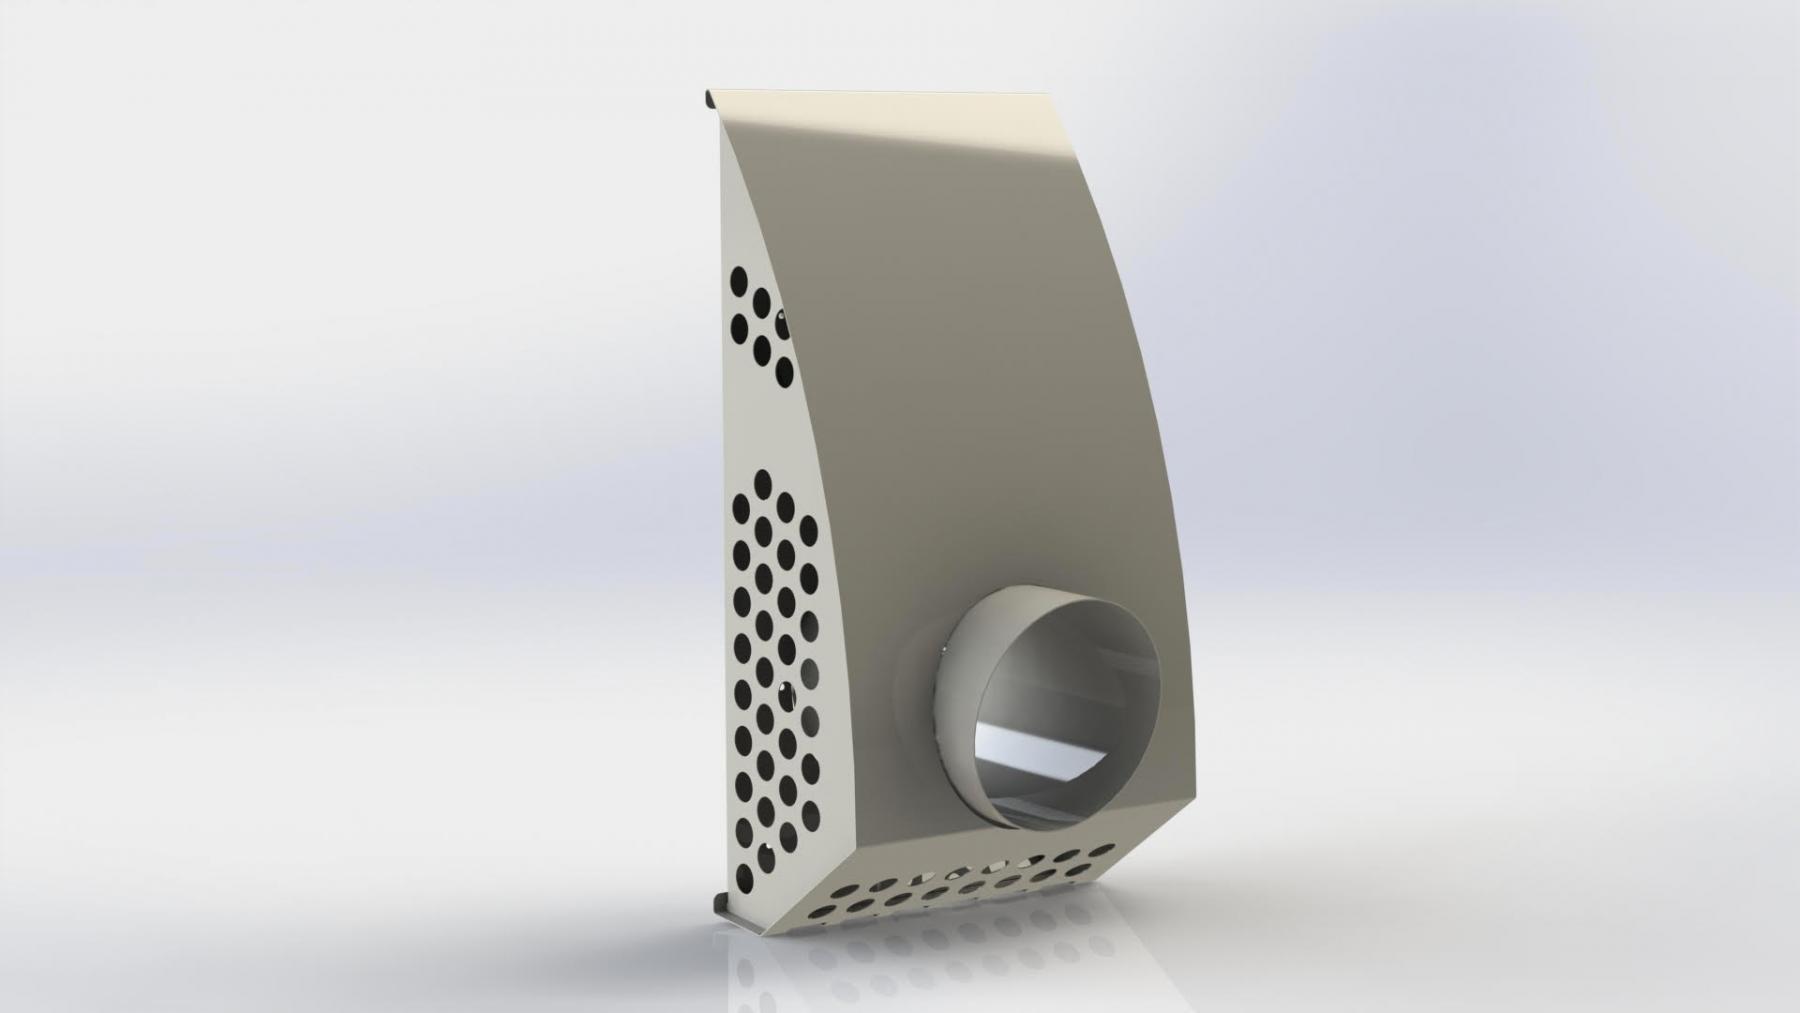 protidazdova-vzduchotechnicka-mriezka